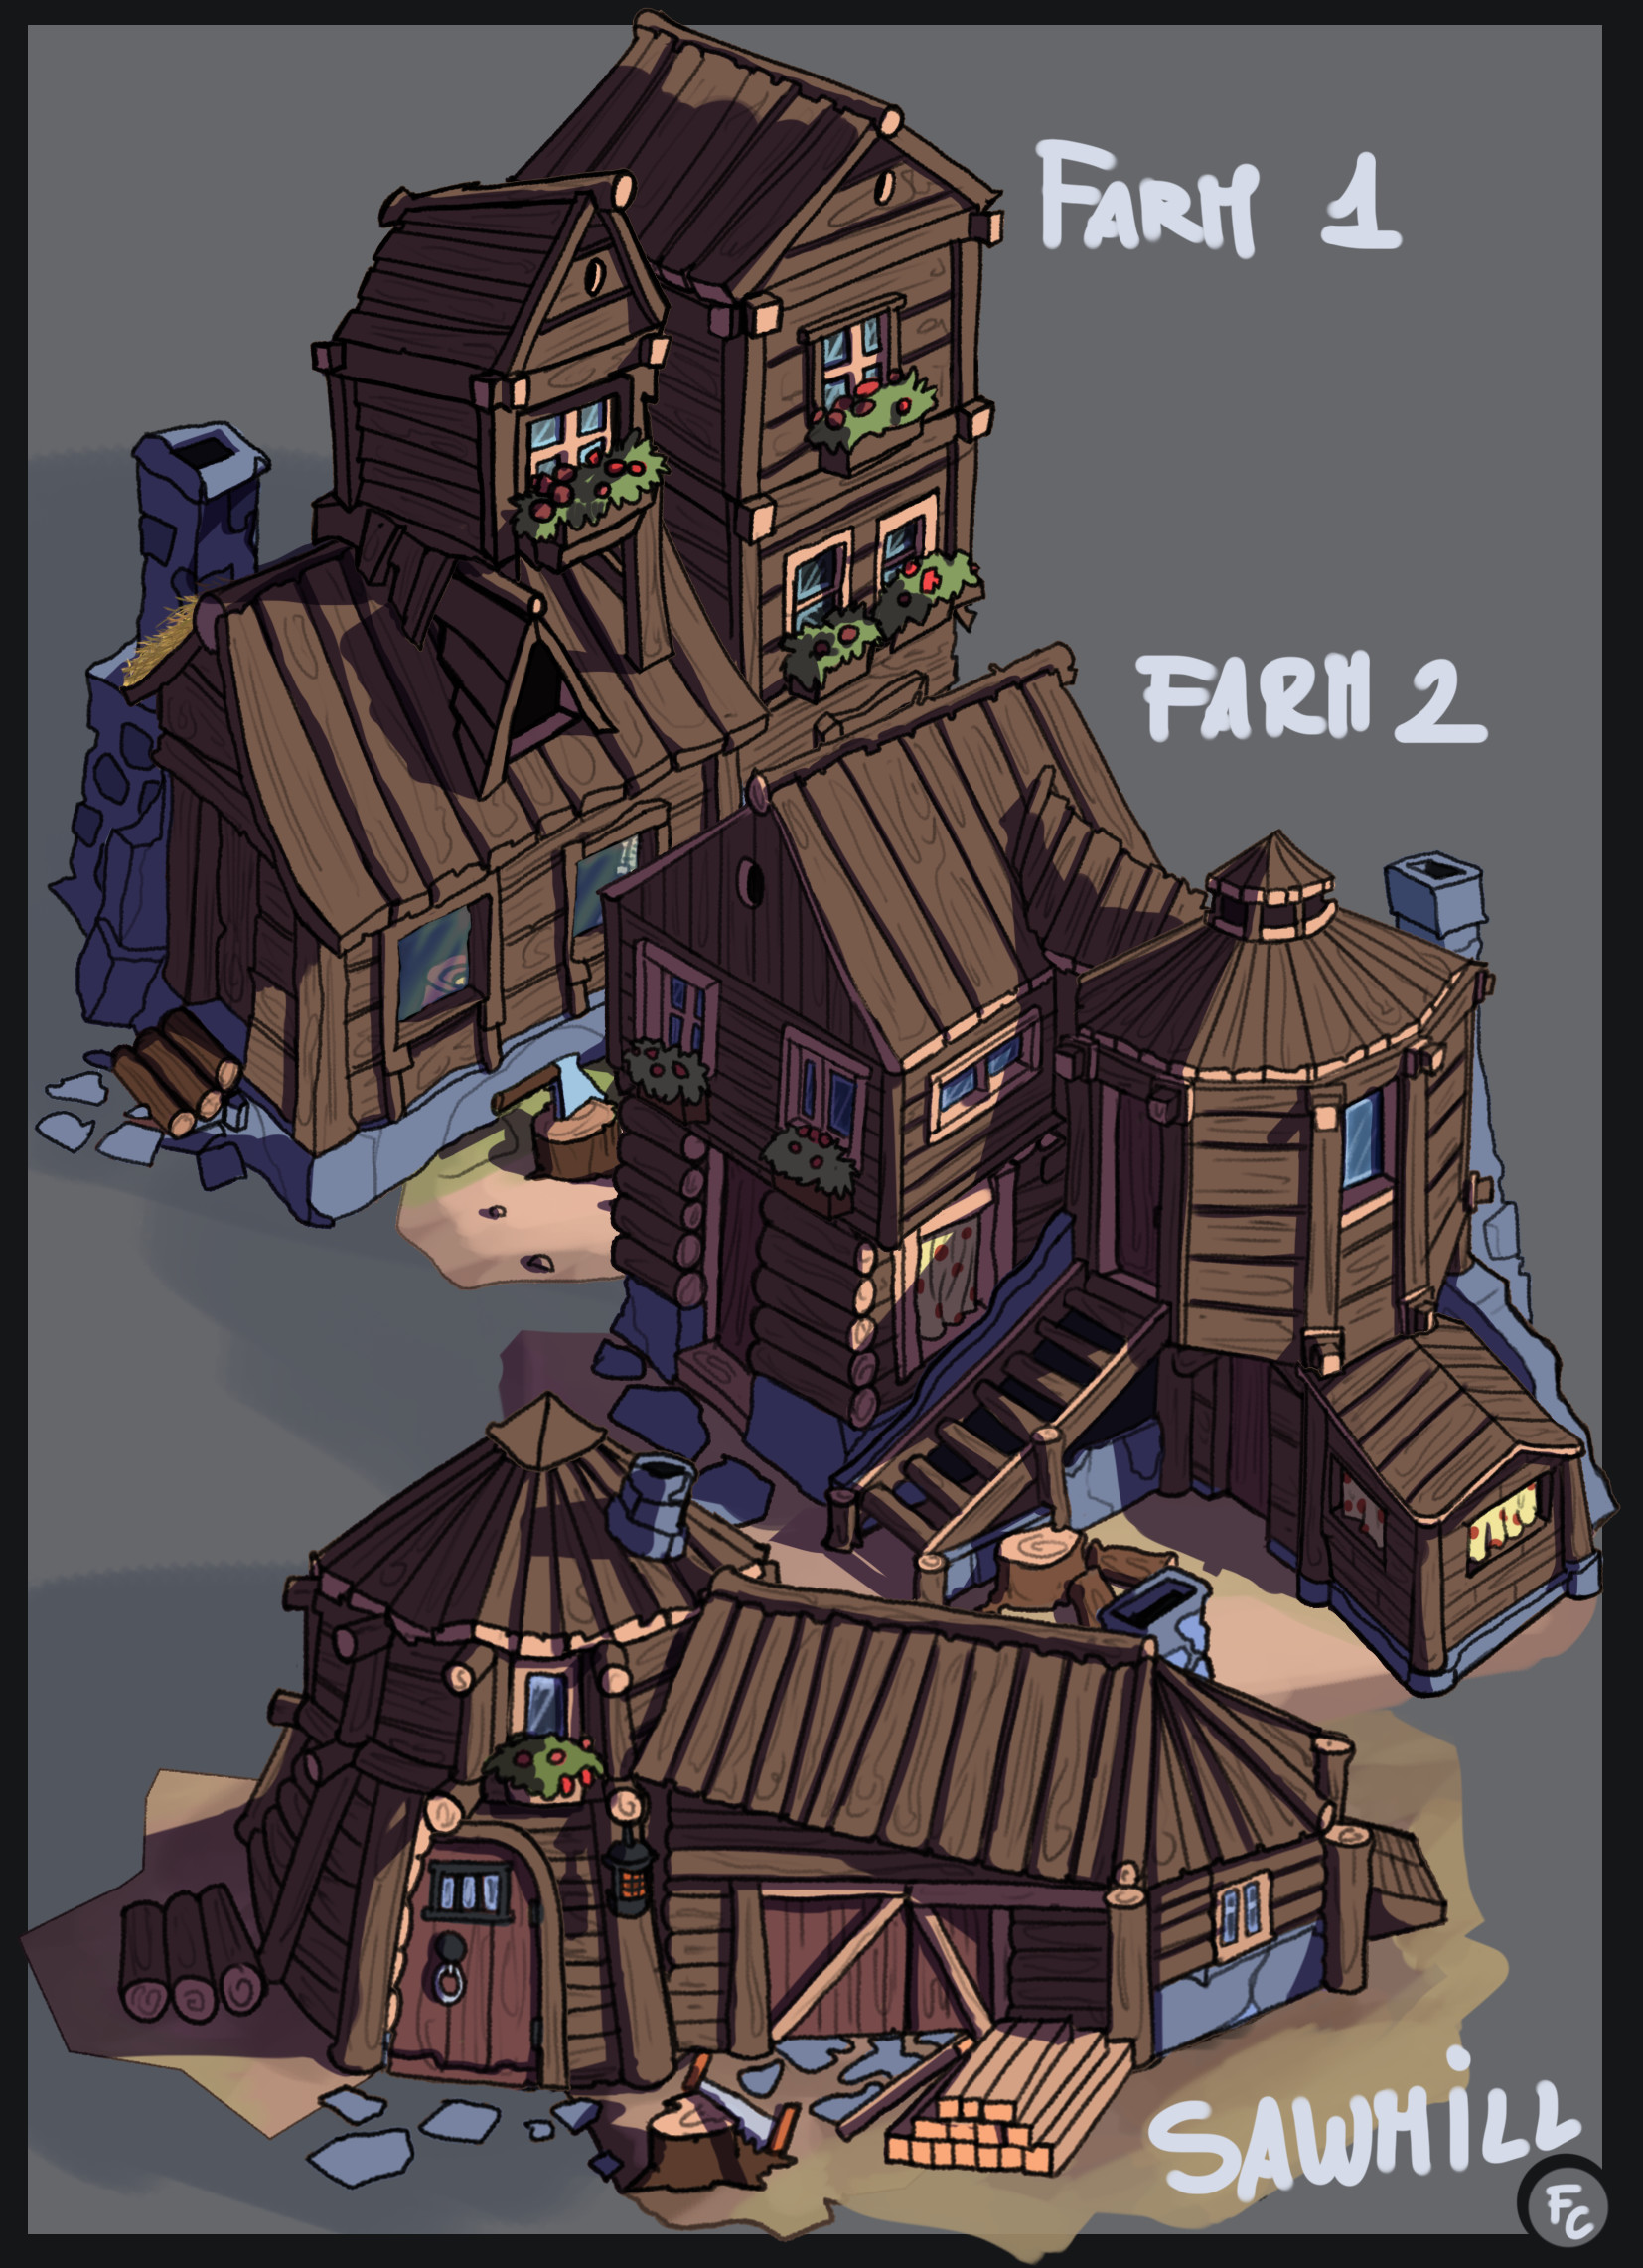 Farm 1 farm 2 and Sawmill